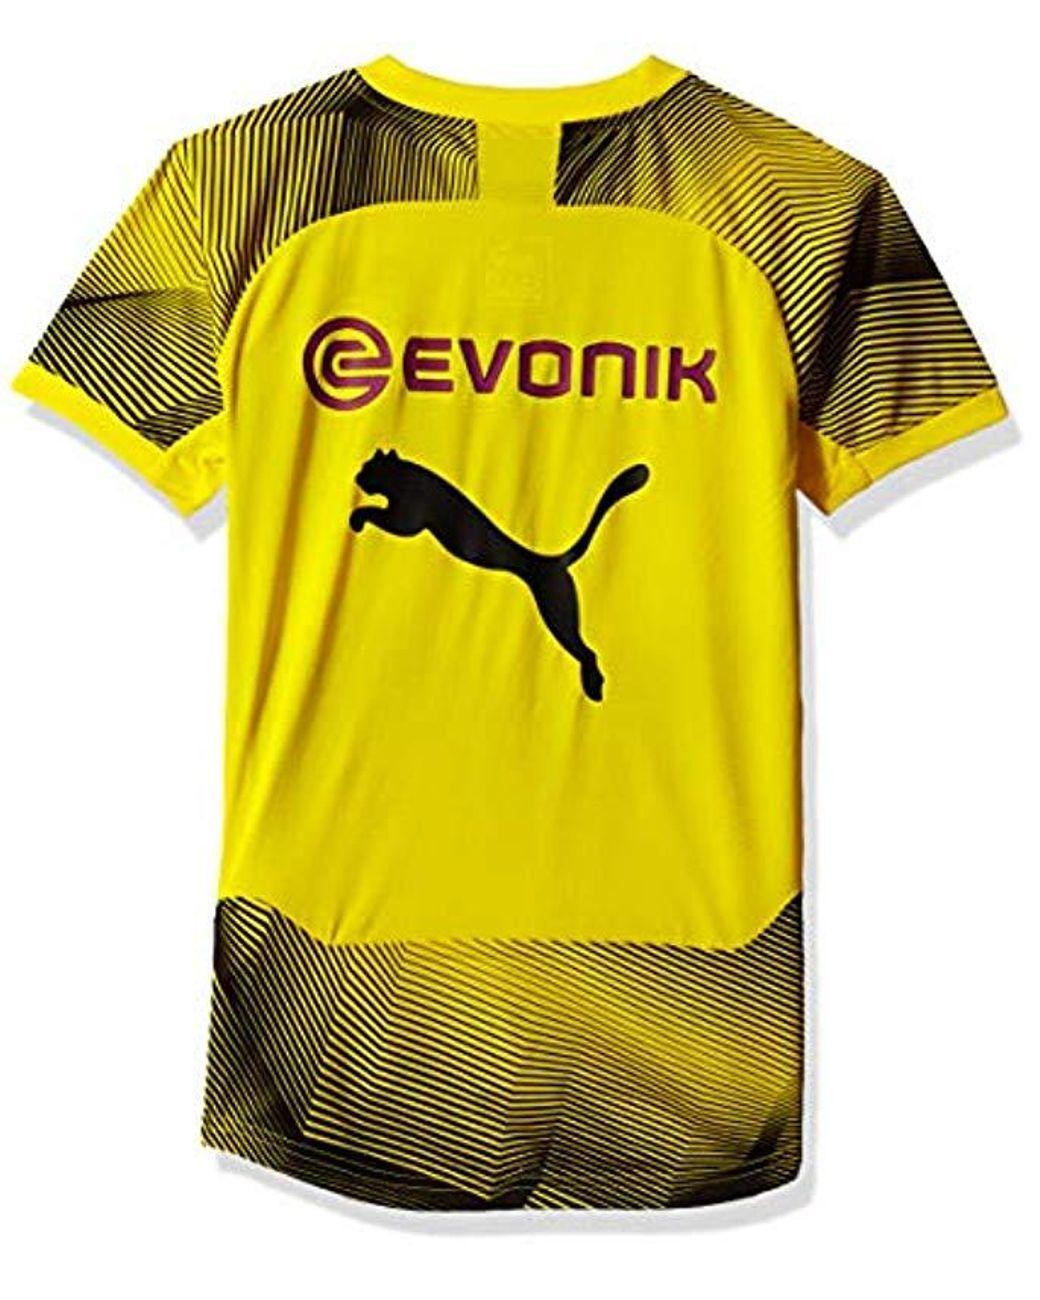 new style 3780c 5bcfc Men's Yellow Bvb Stadium Graphic Jersey Jr With Sponsor Logo